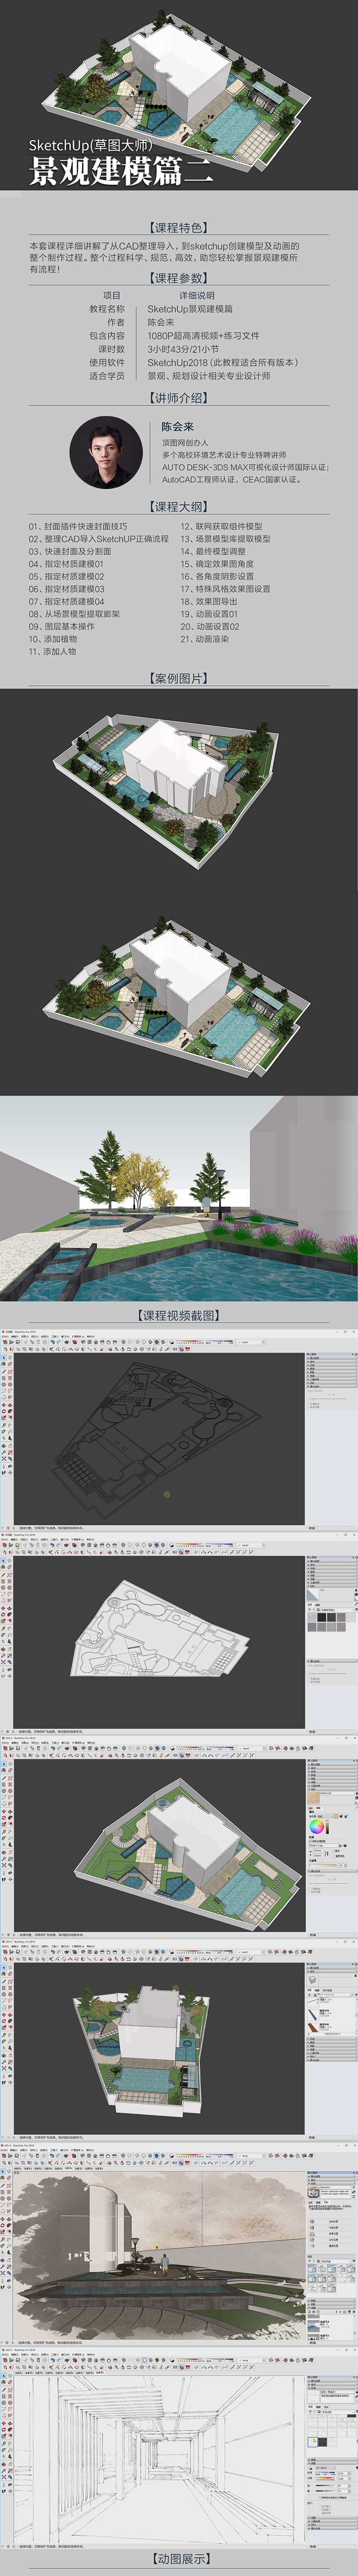 SketchUp景观建模案例篇B